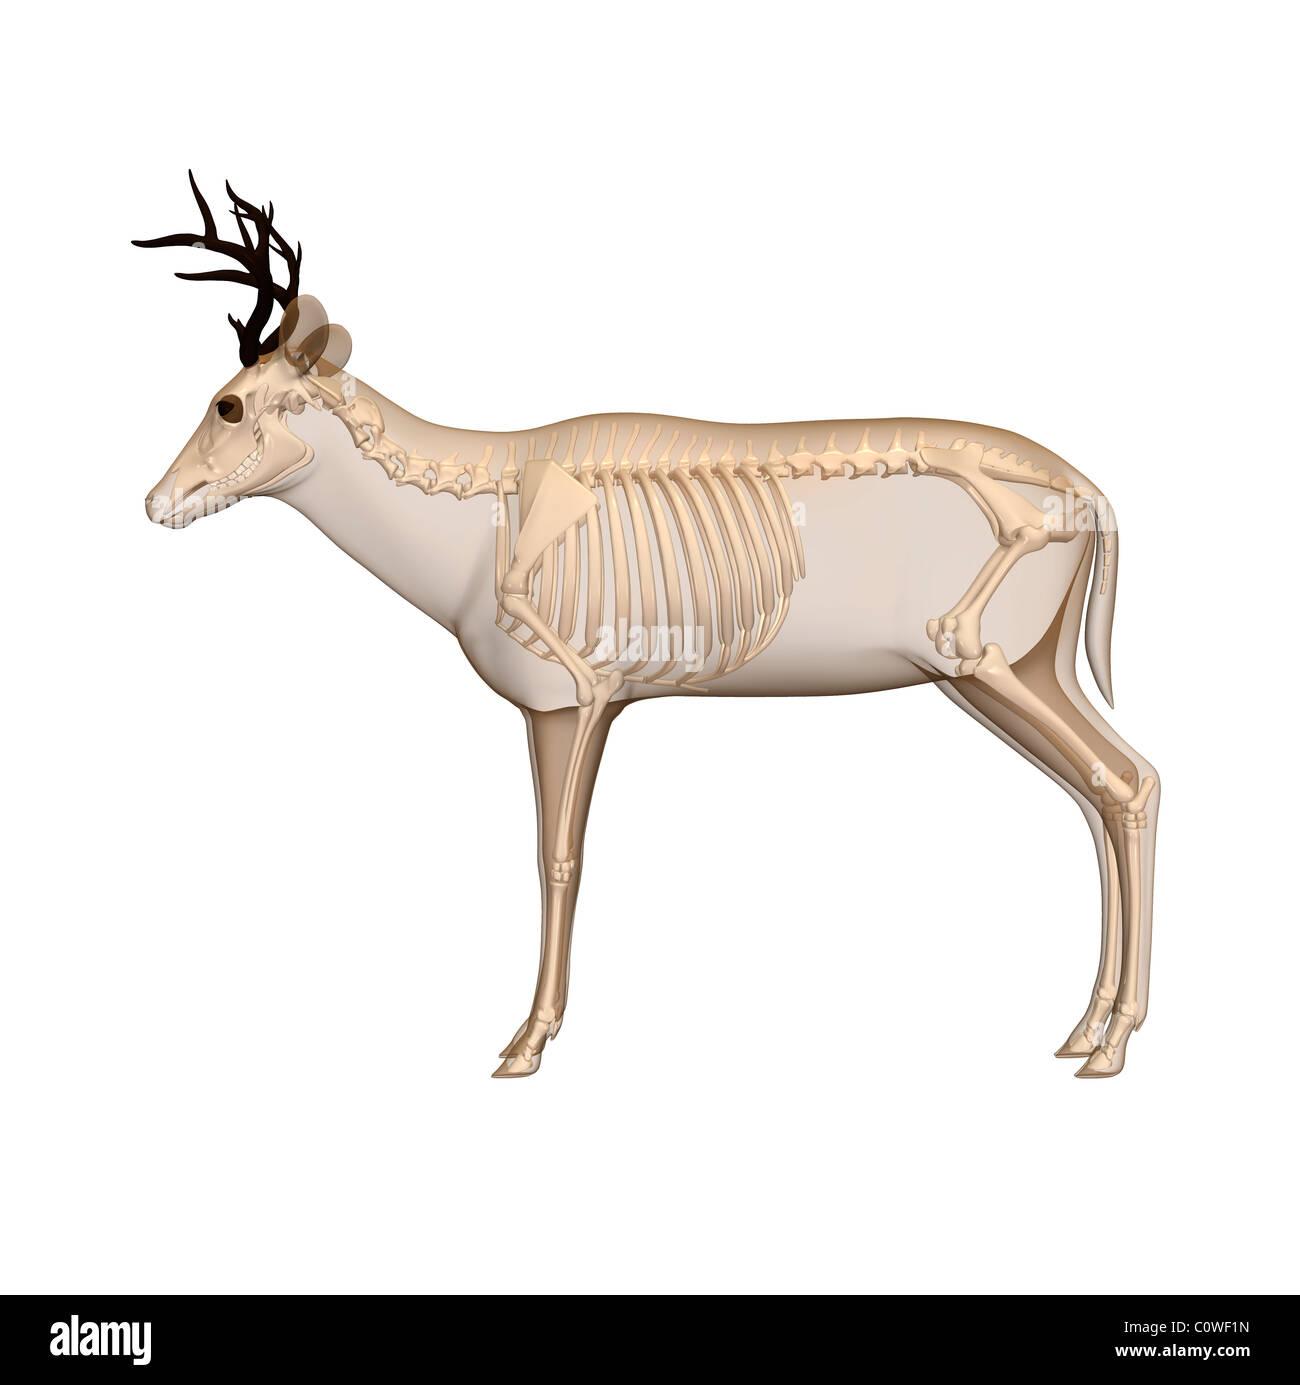 deer anatomy skeleton Stock Photo: 34981345 - Alamy